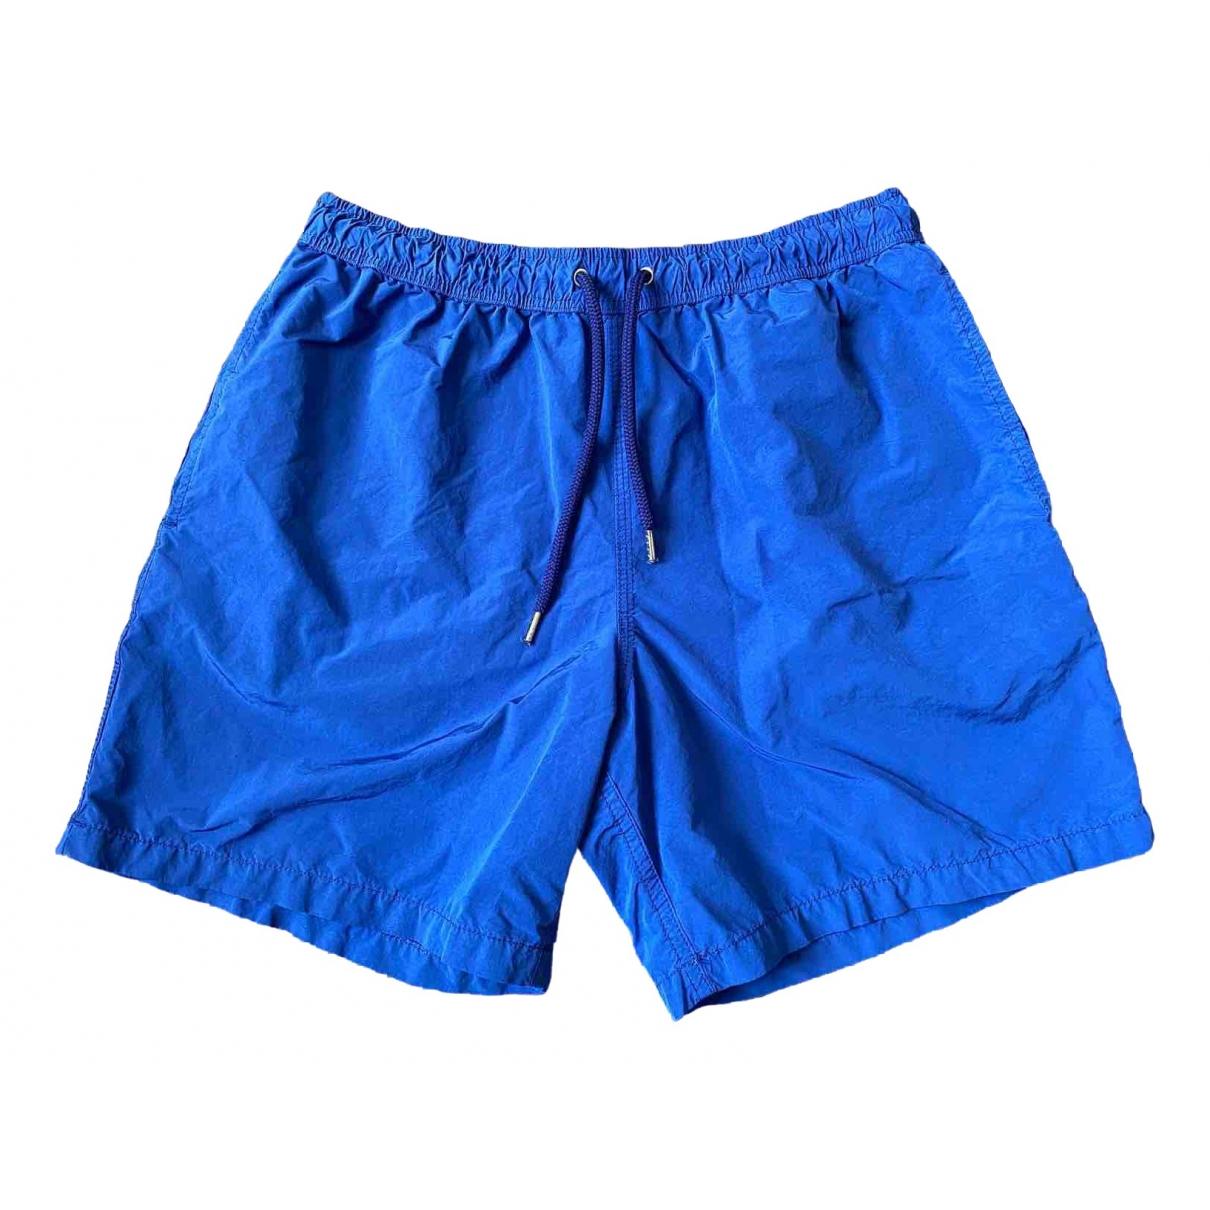 Aspesi \N Badeanzug in  Blau Polyester